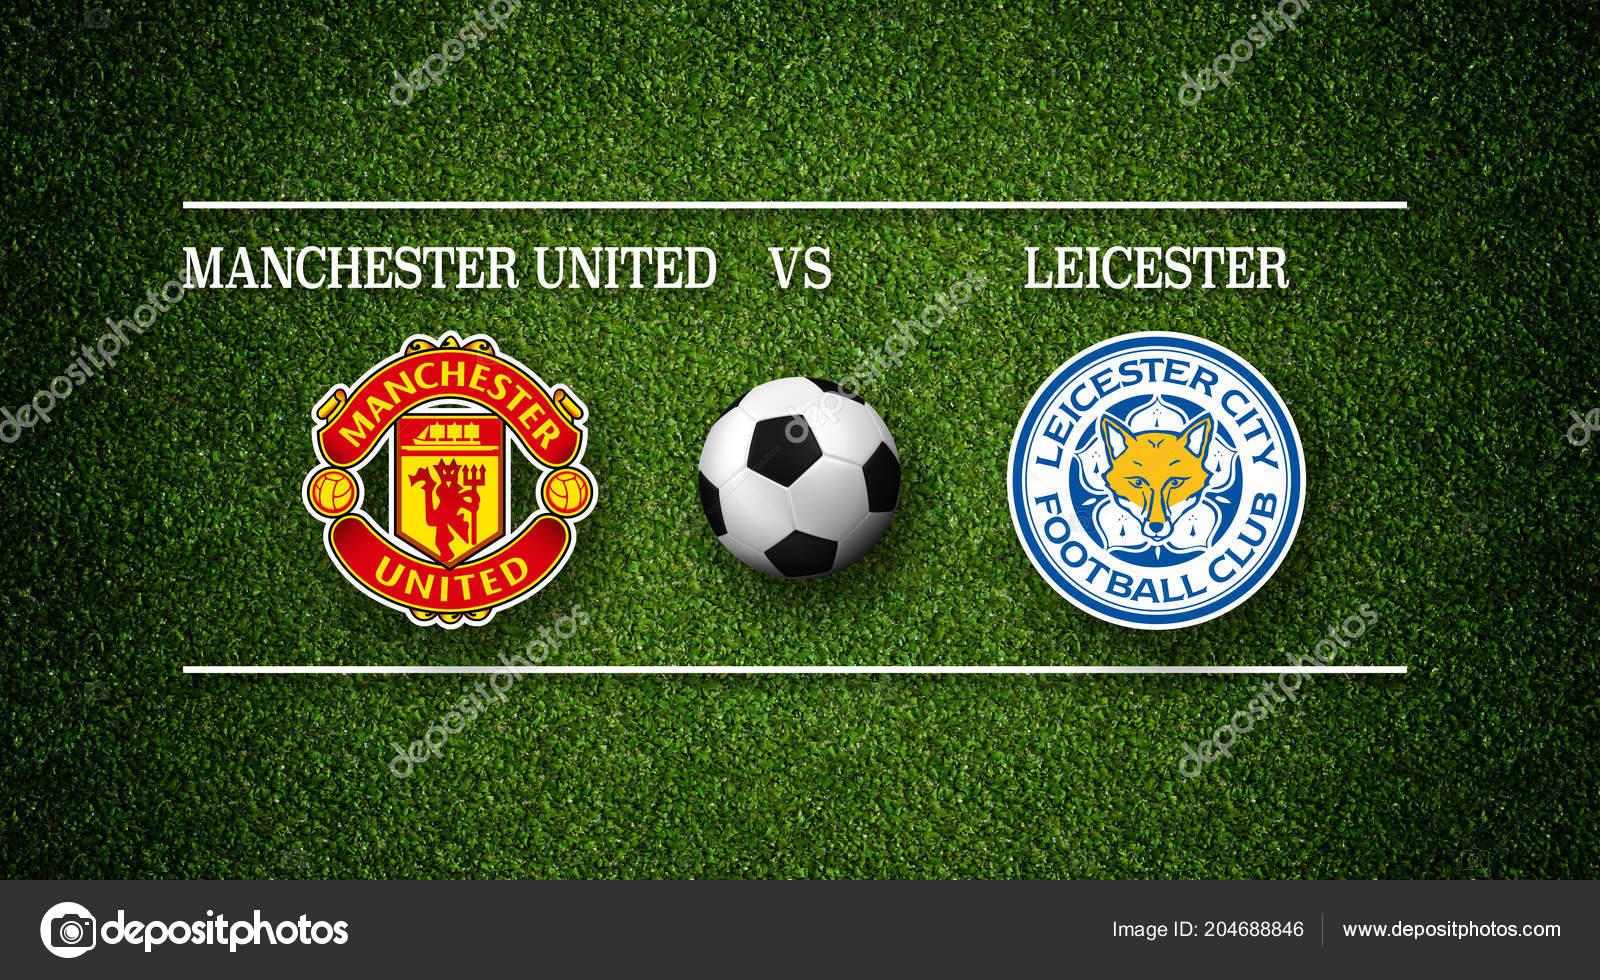 Manchester United Calendario.Roma Italia Julho 2018 Calendario Jogos Futebol Manchester